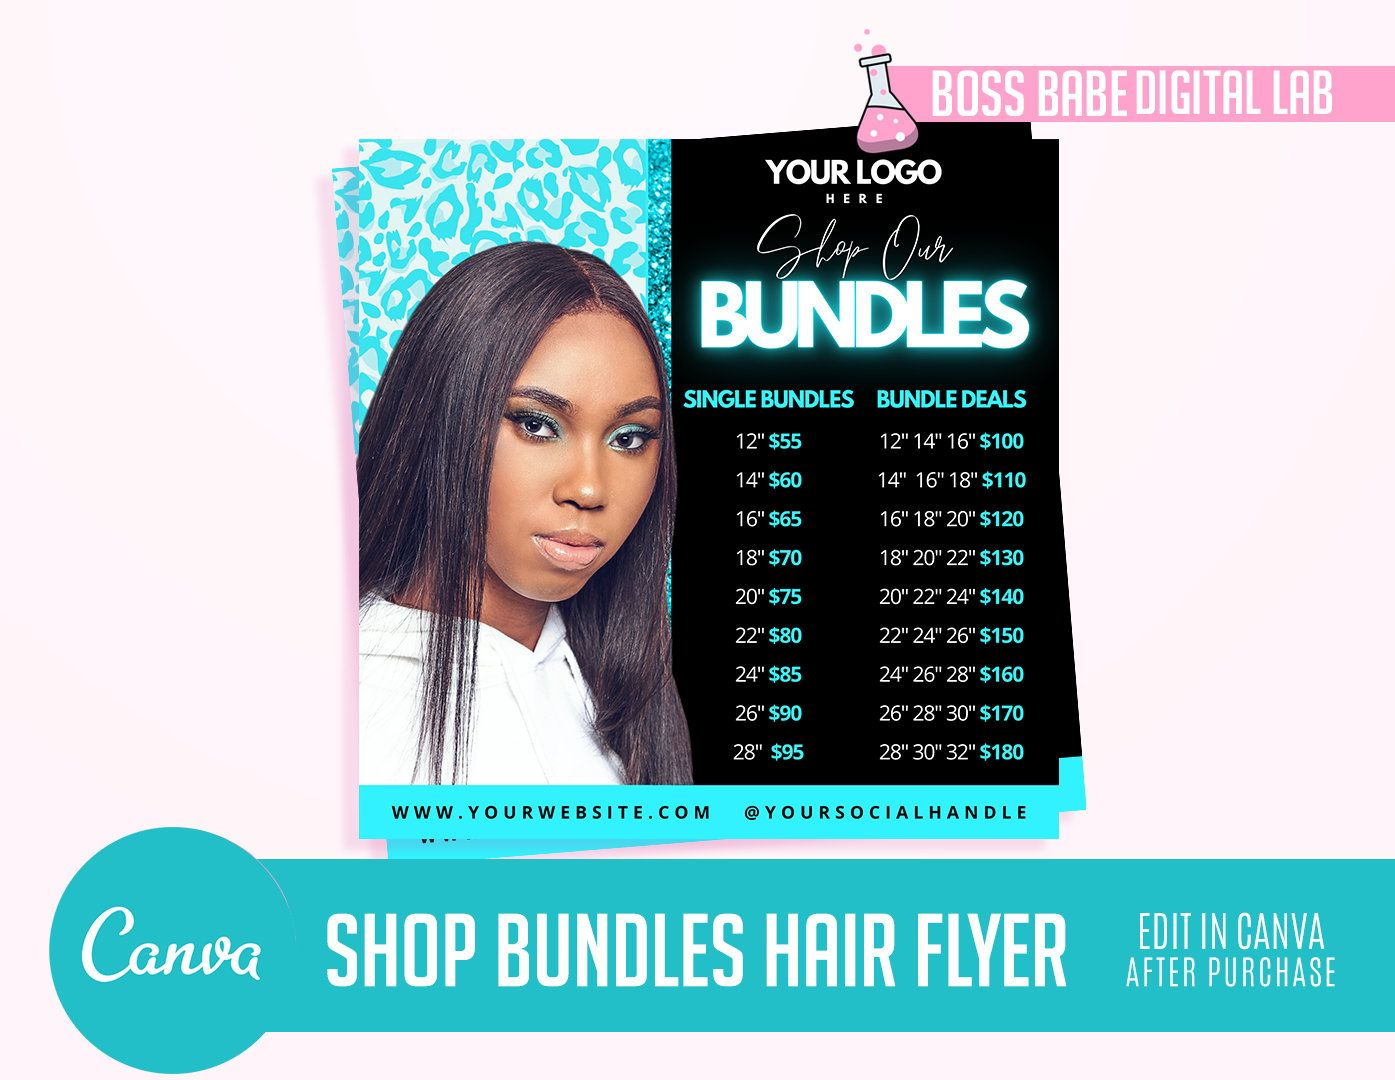 DIY Hair Flyer DIY Hair Flyer Beauty Social Media Template Hair Bundles Instagram Template DIY Fully Stocked Hair Flyer Template